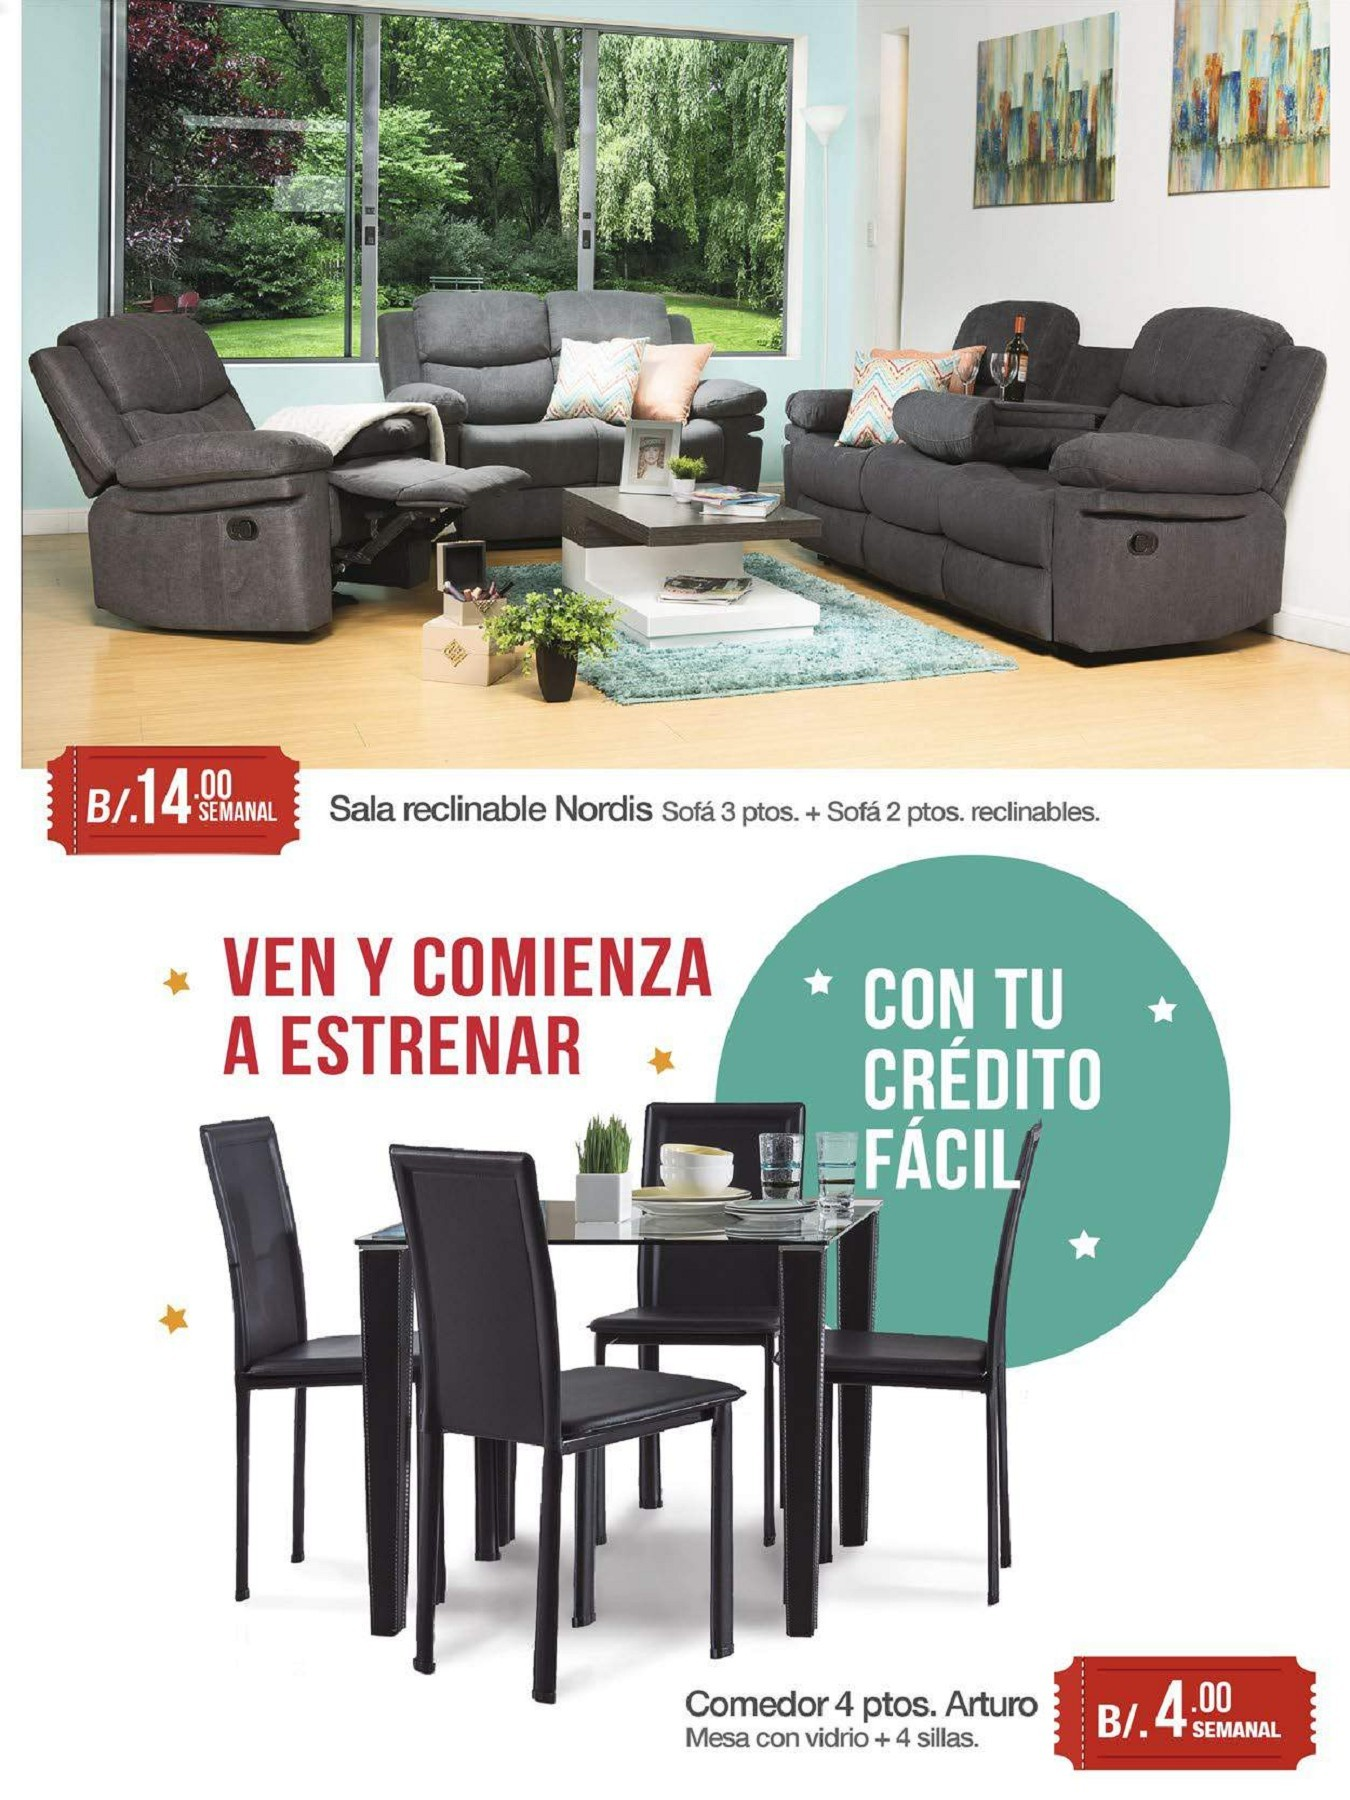 Catalogo Jamar Julio año 2019 p5